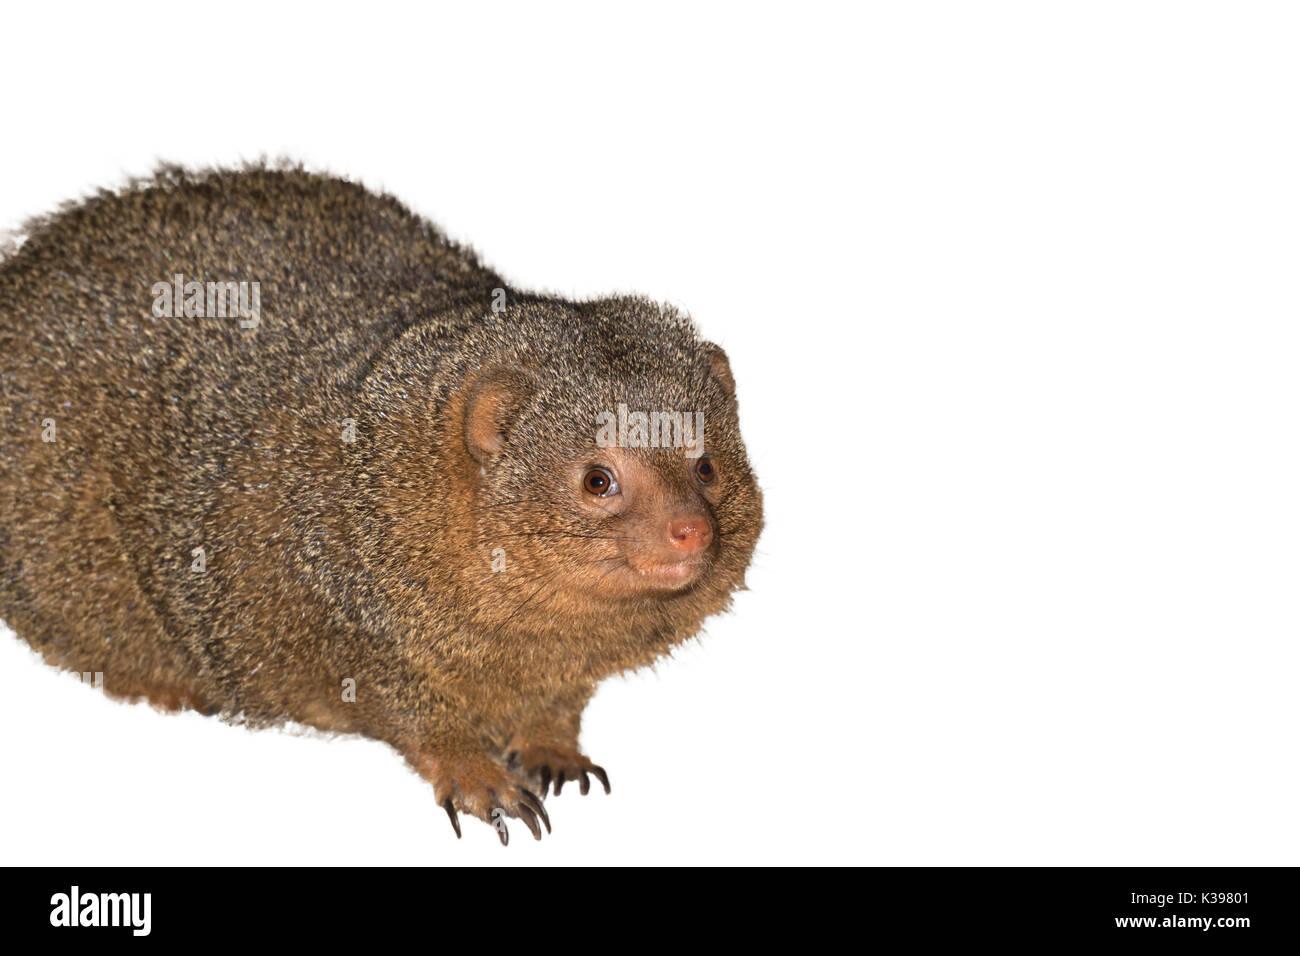 Common dwarf mongooses, Helogale parvula  isolated on white background - Stock Image